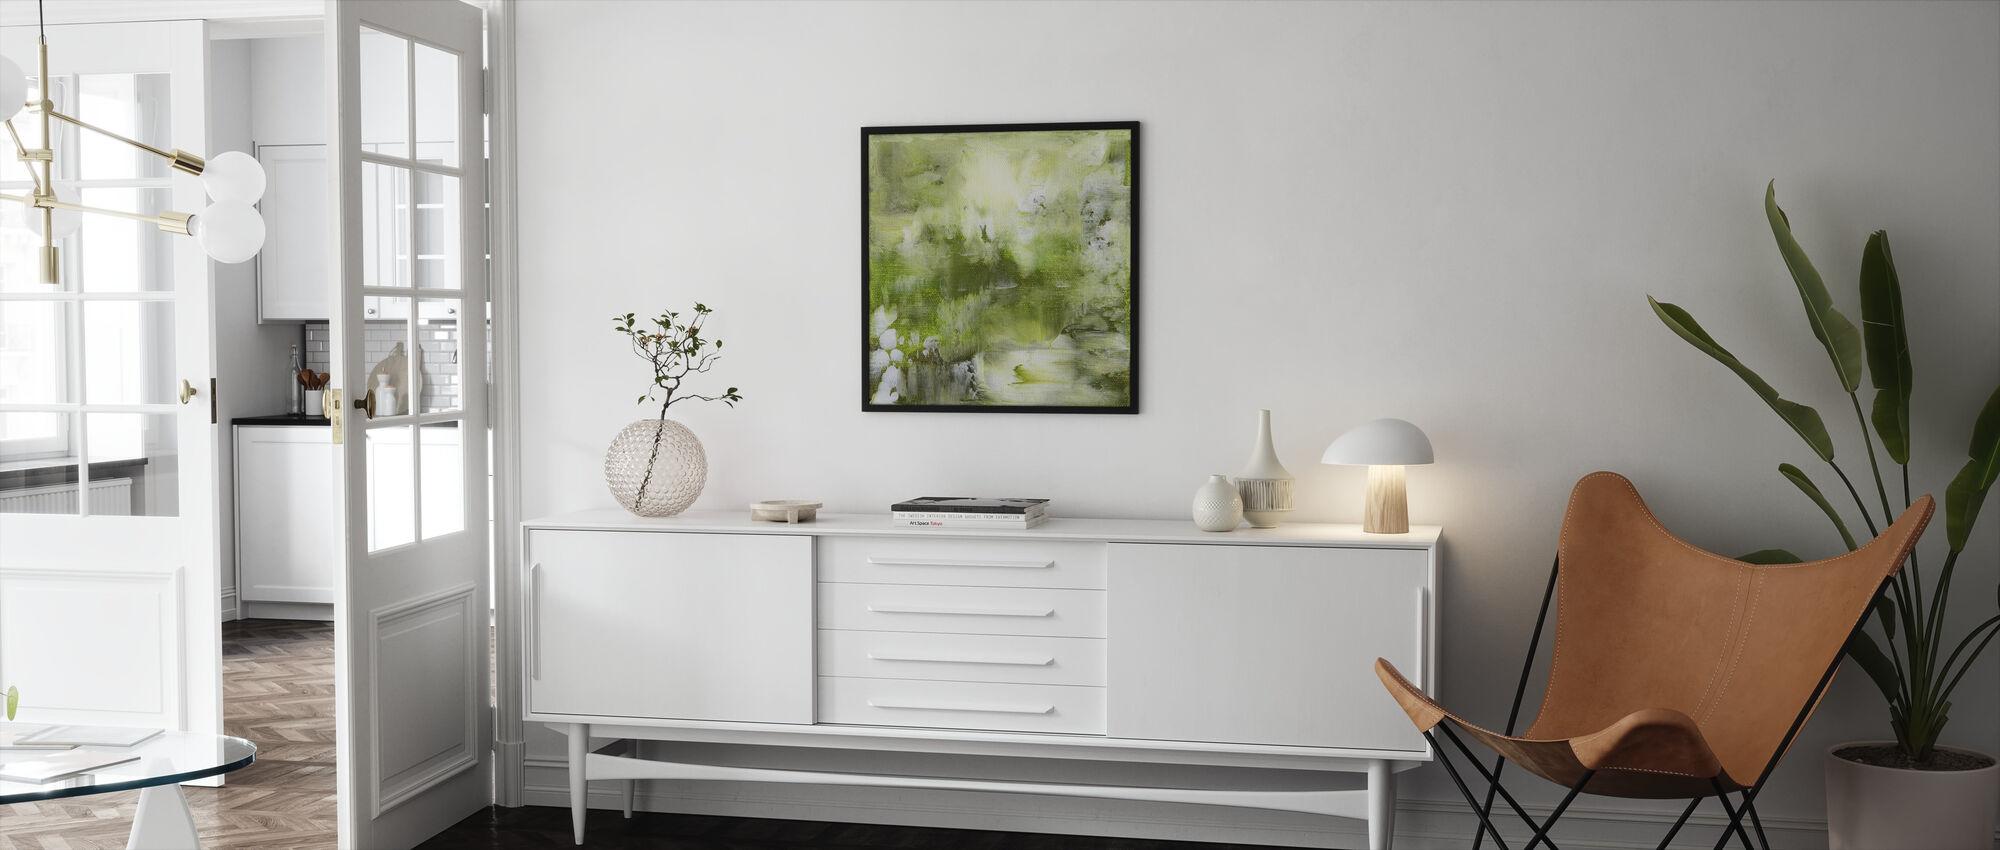 Shades of Green - Framed print - Living Room